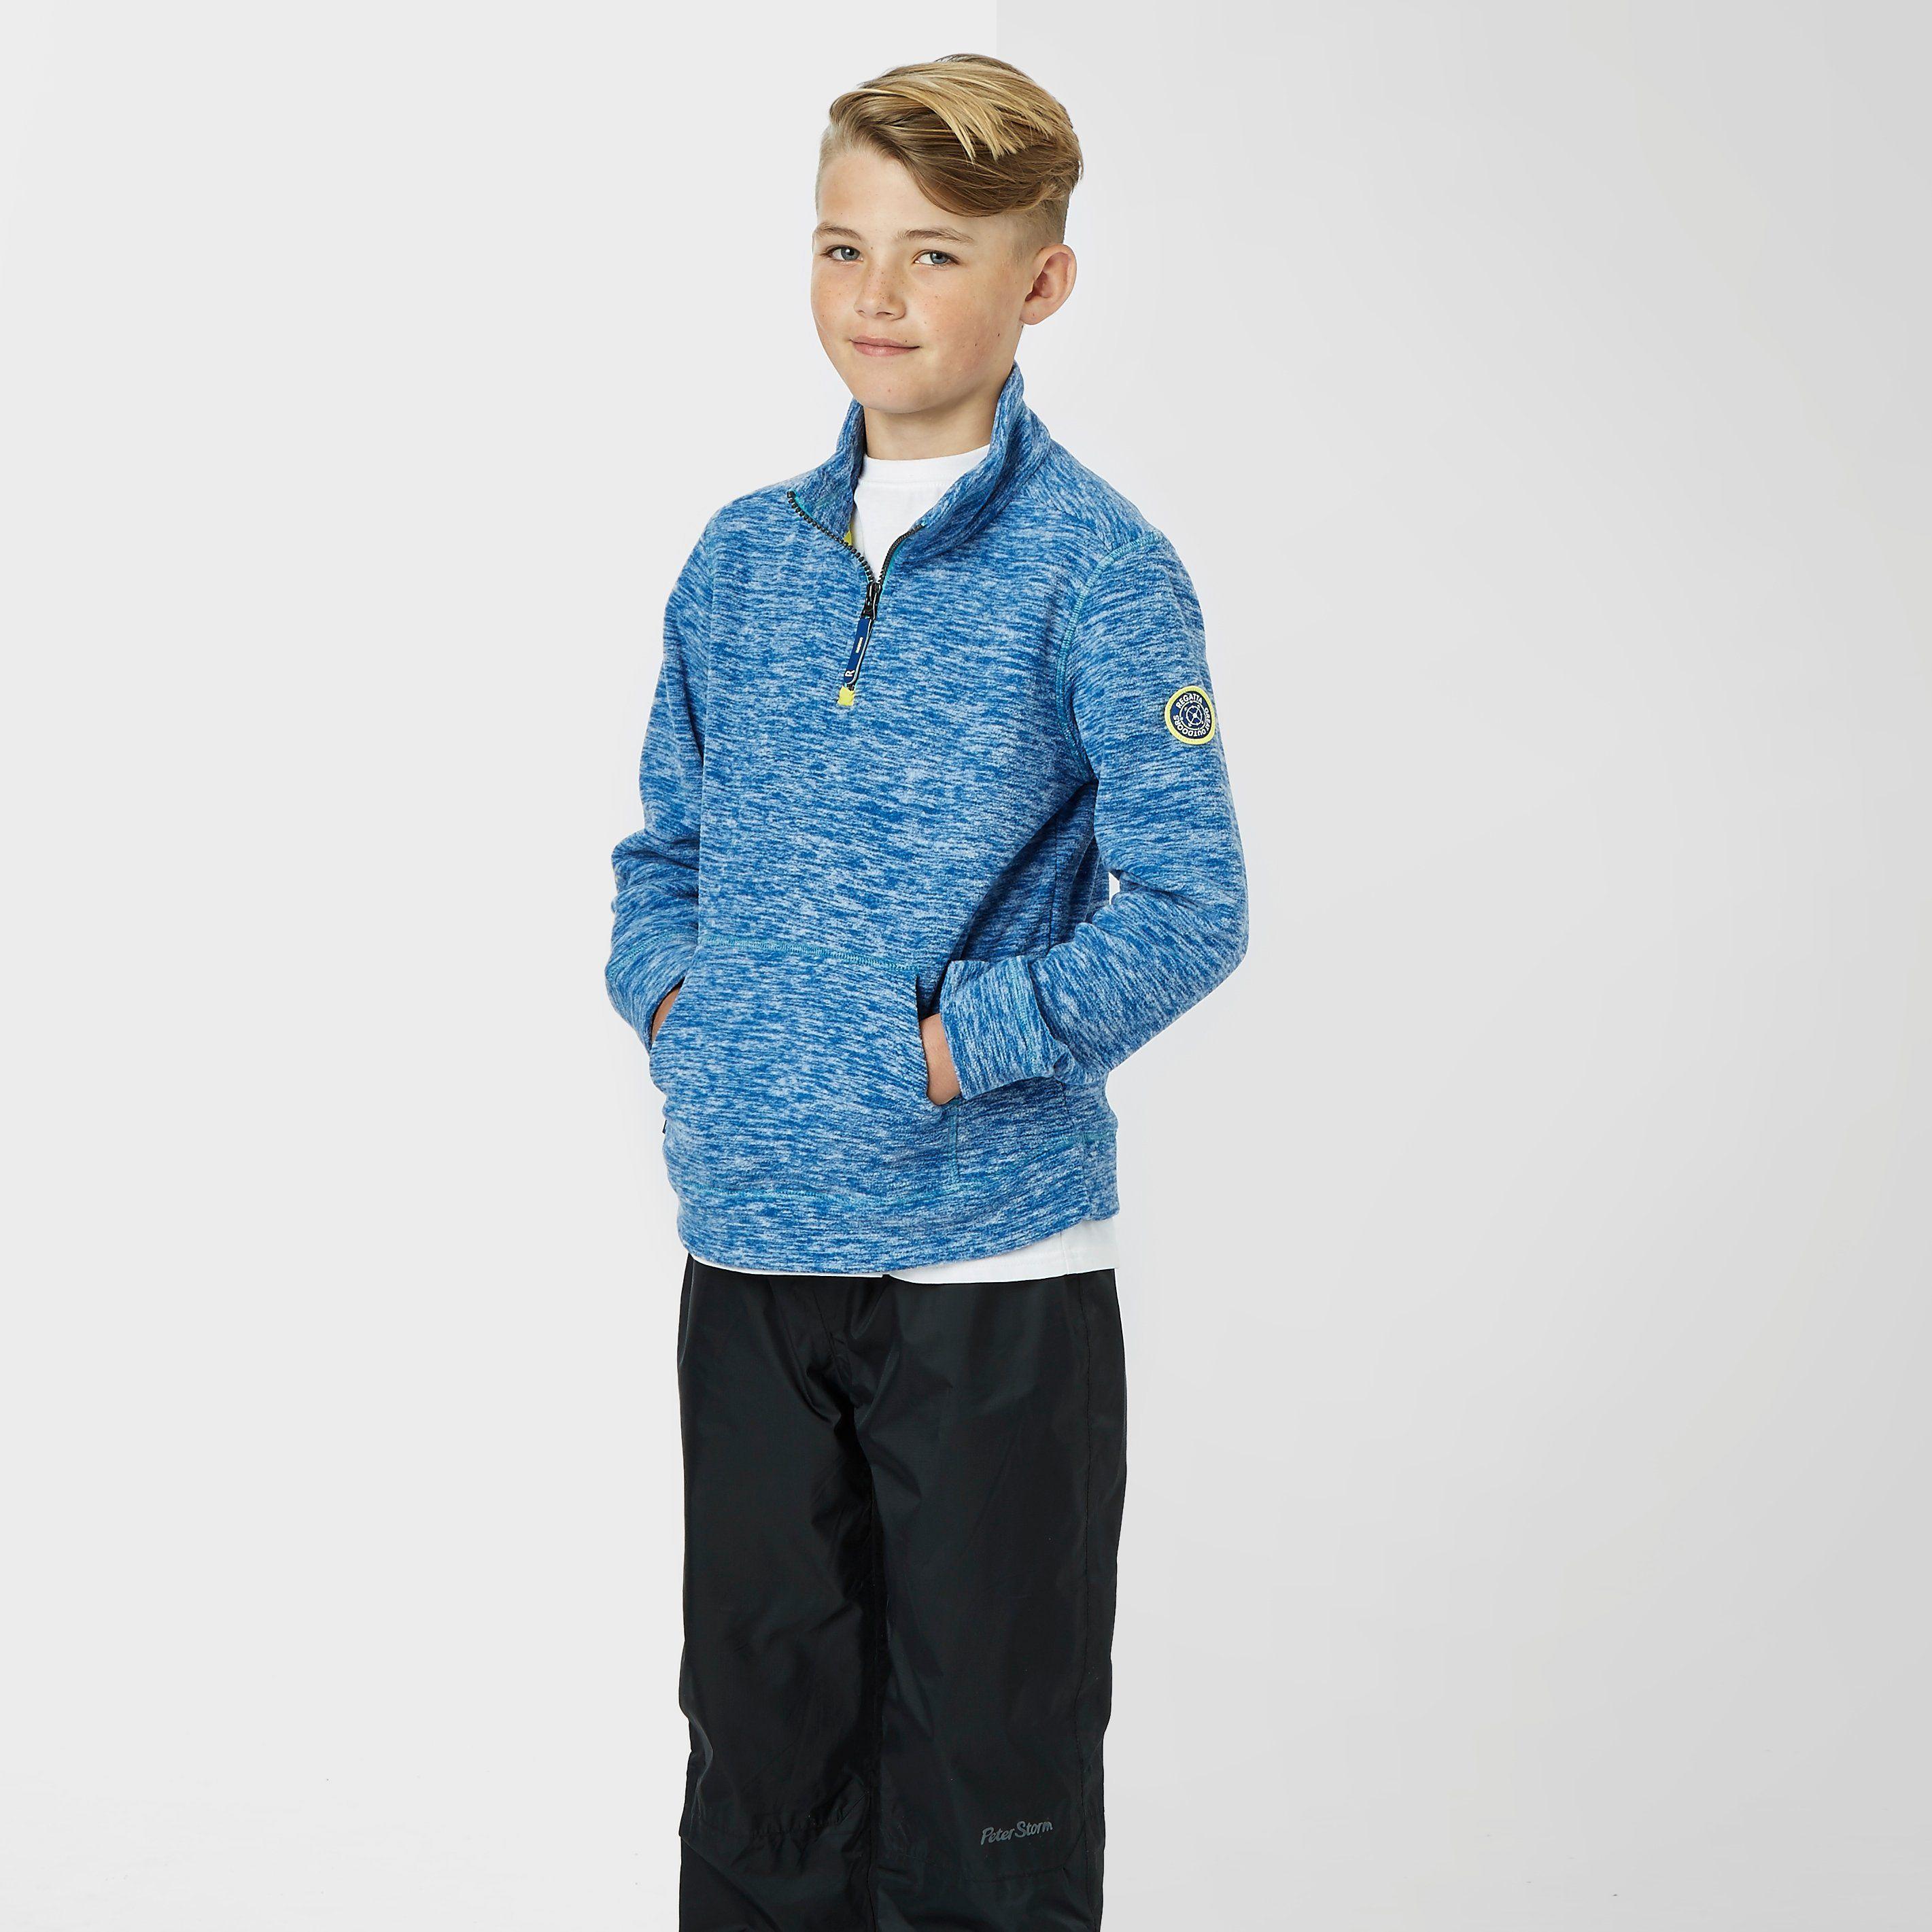 REGATTA Boy's Berty Quarter-Zip Fleece